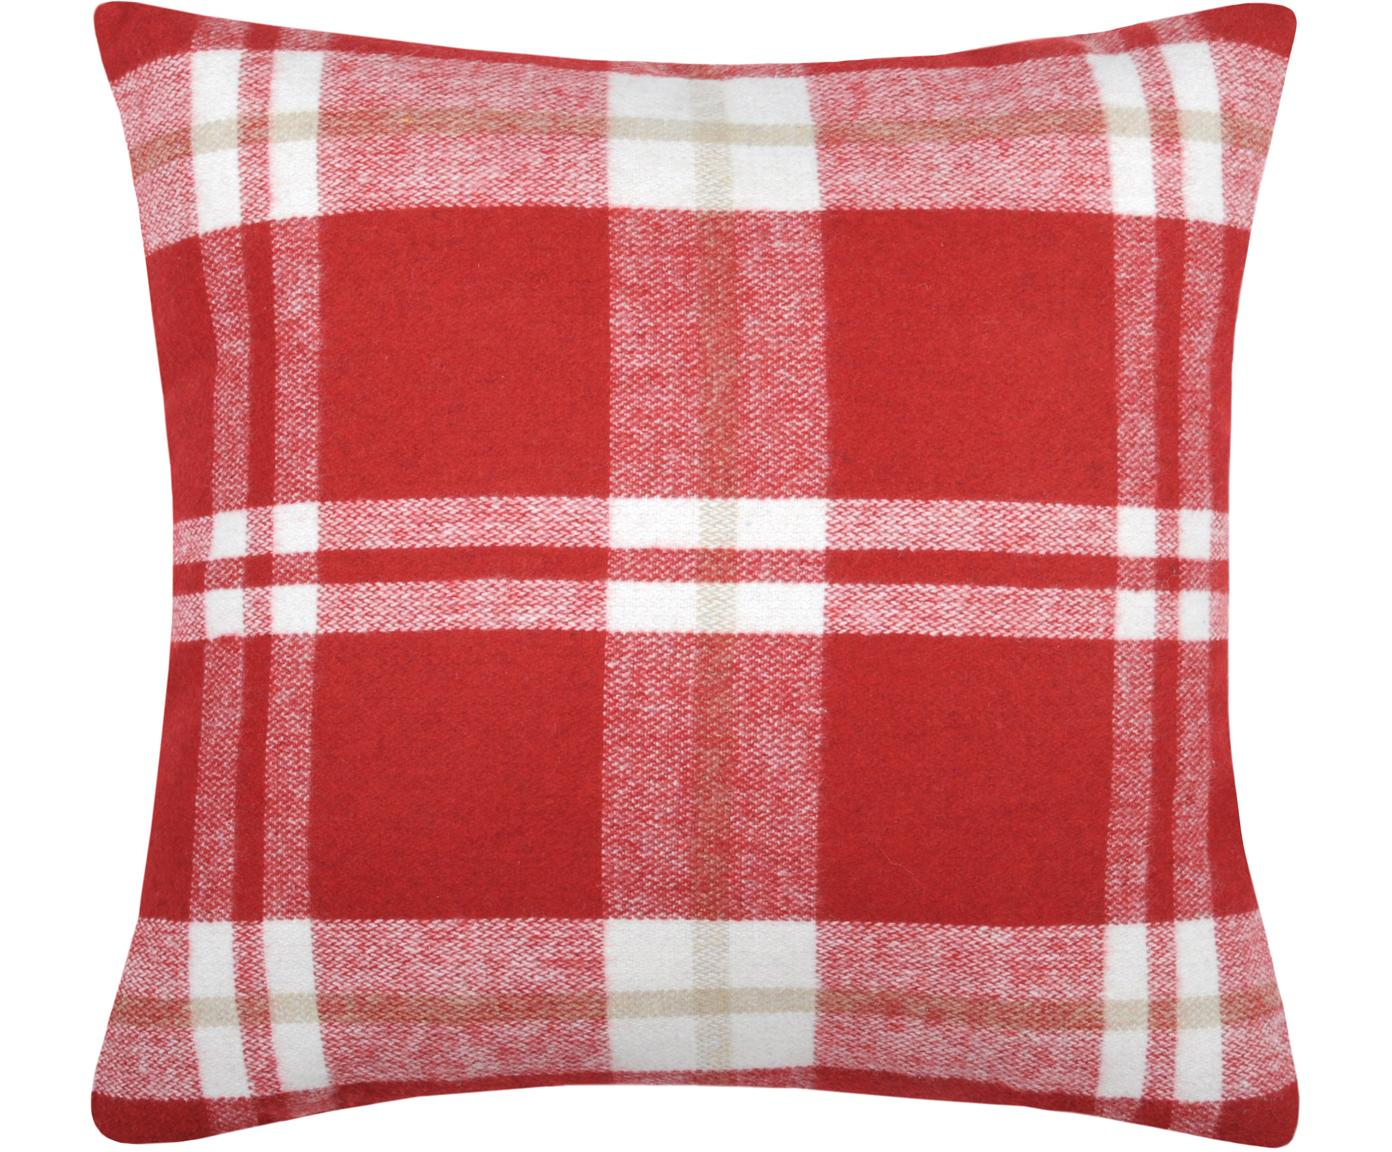 Federa arredo a quadri Granier, 95% poliestere, 5% lana, Rosso, bianco, beige, Larg. 40 x Lung. 40 cm